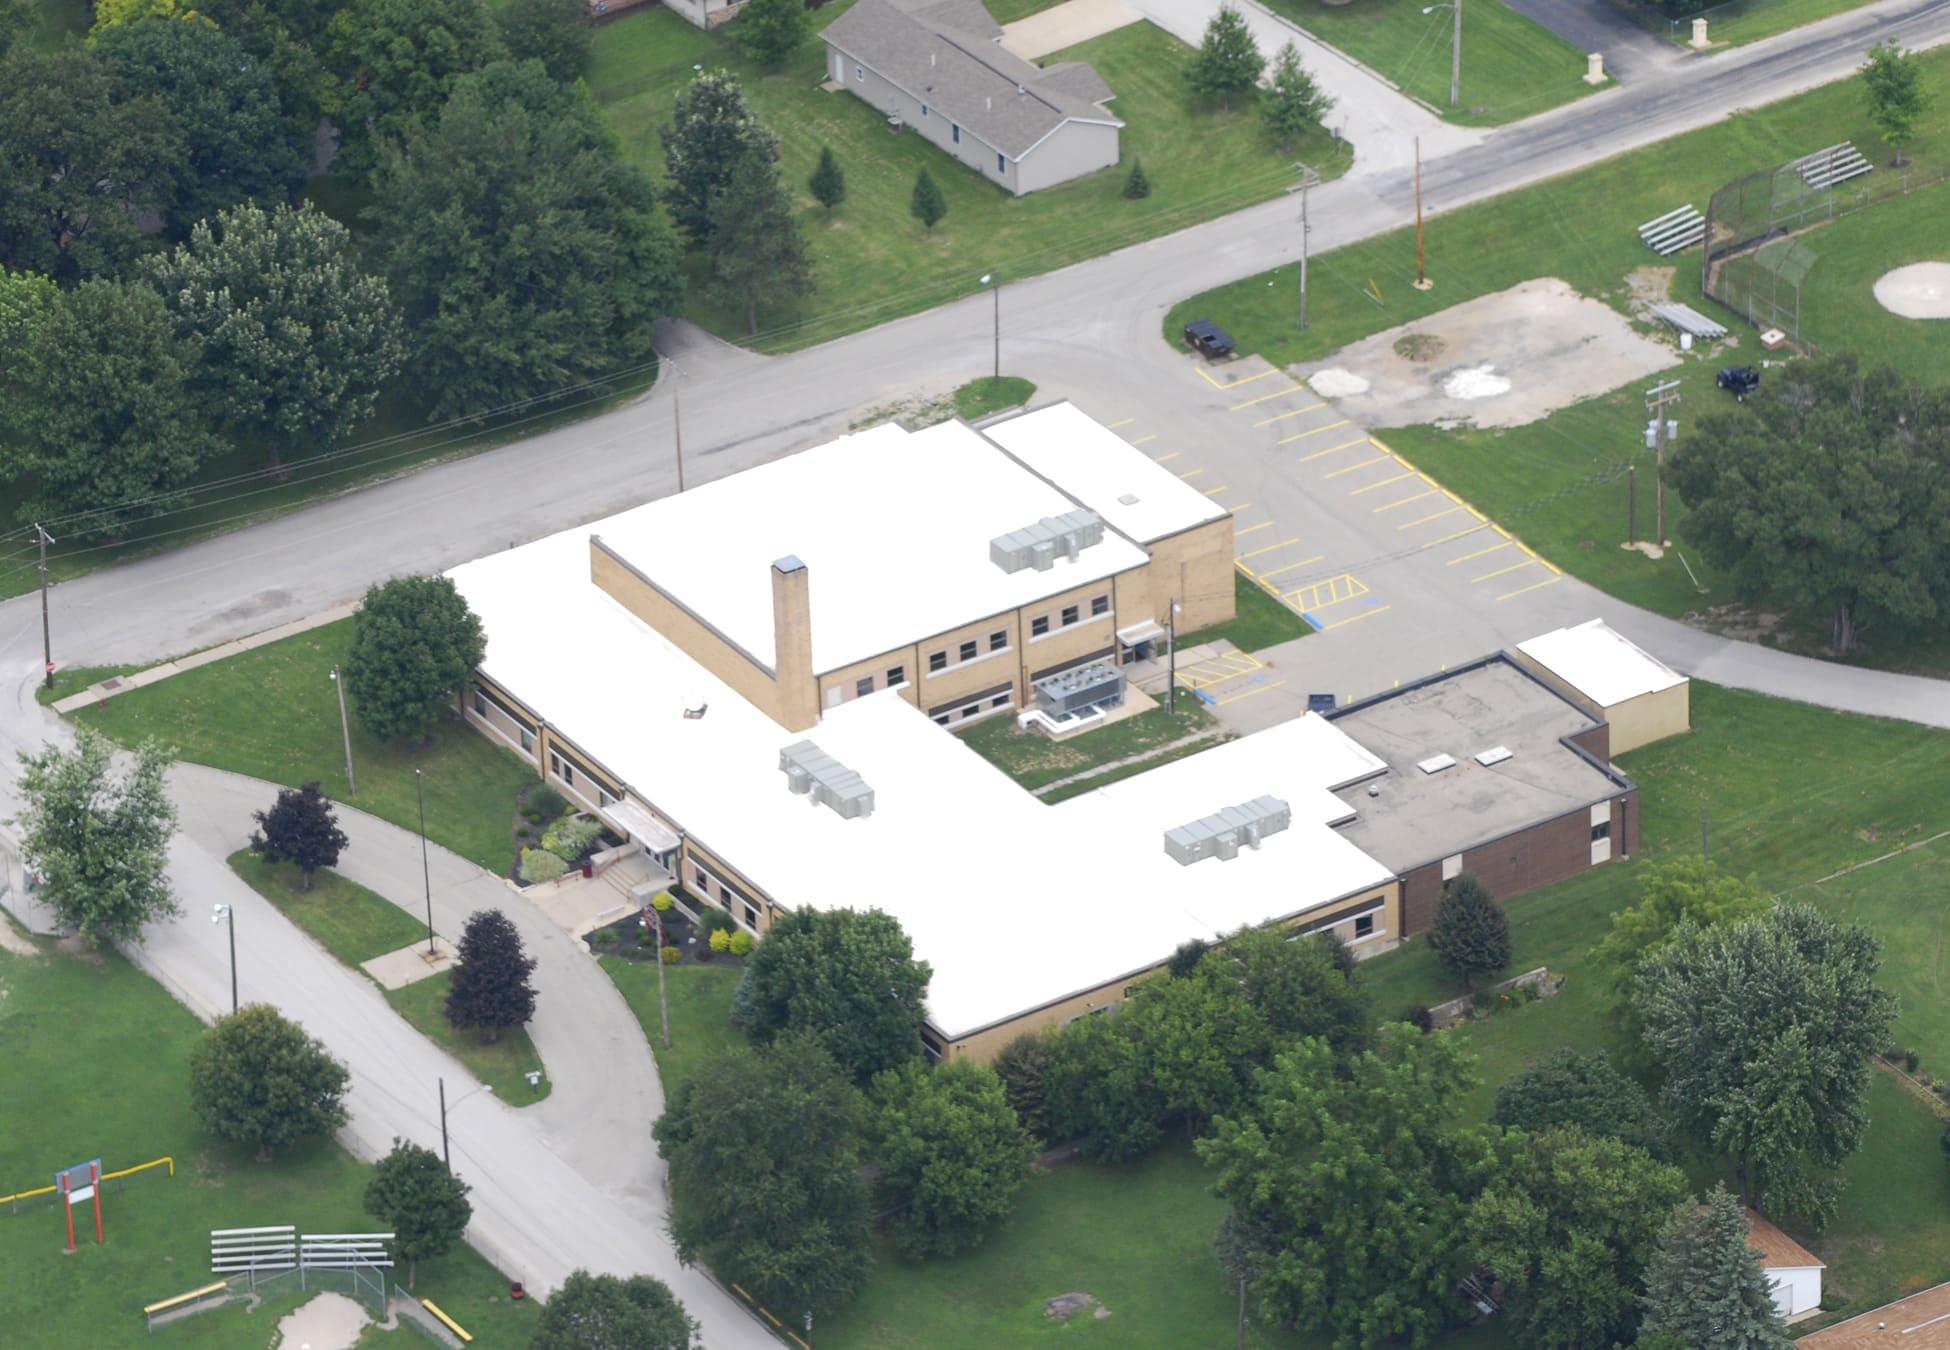 Flat Roof Commercial Roofing Contractors Westville, IL